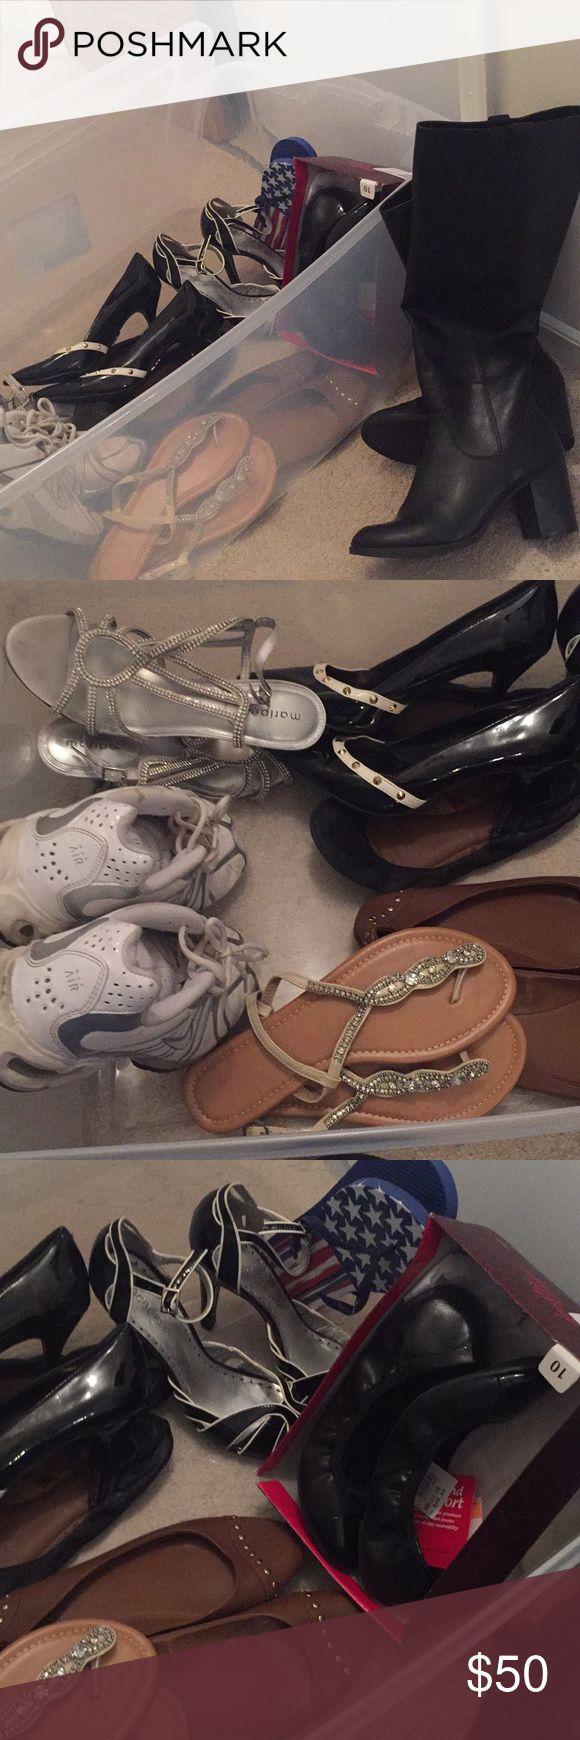 Best 25+ Wedding tennis shoes ideas on Pinterest